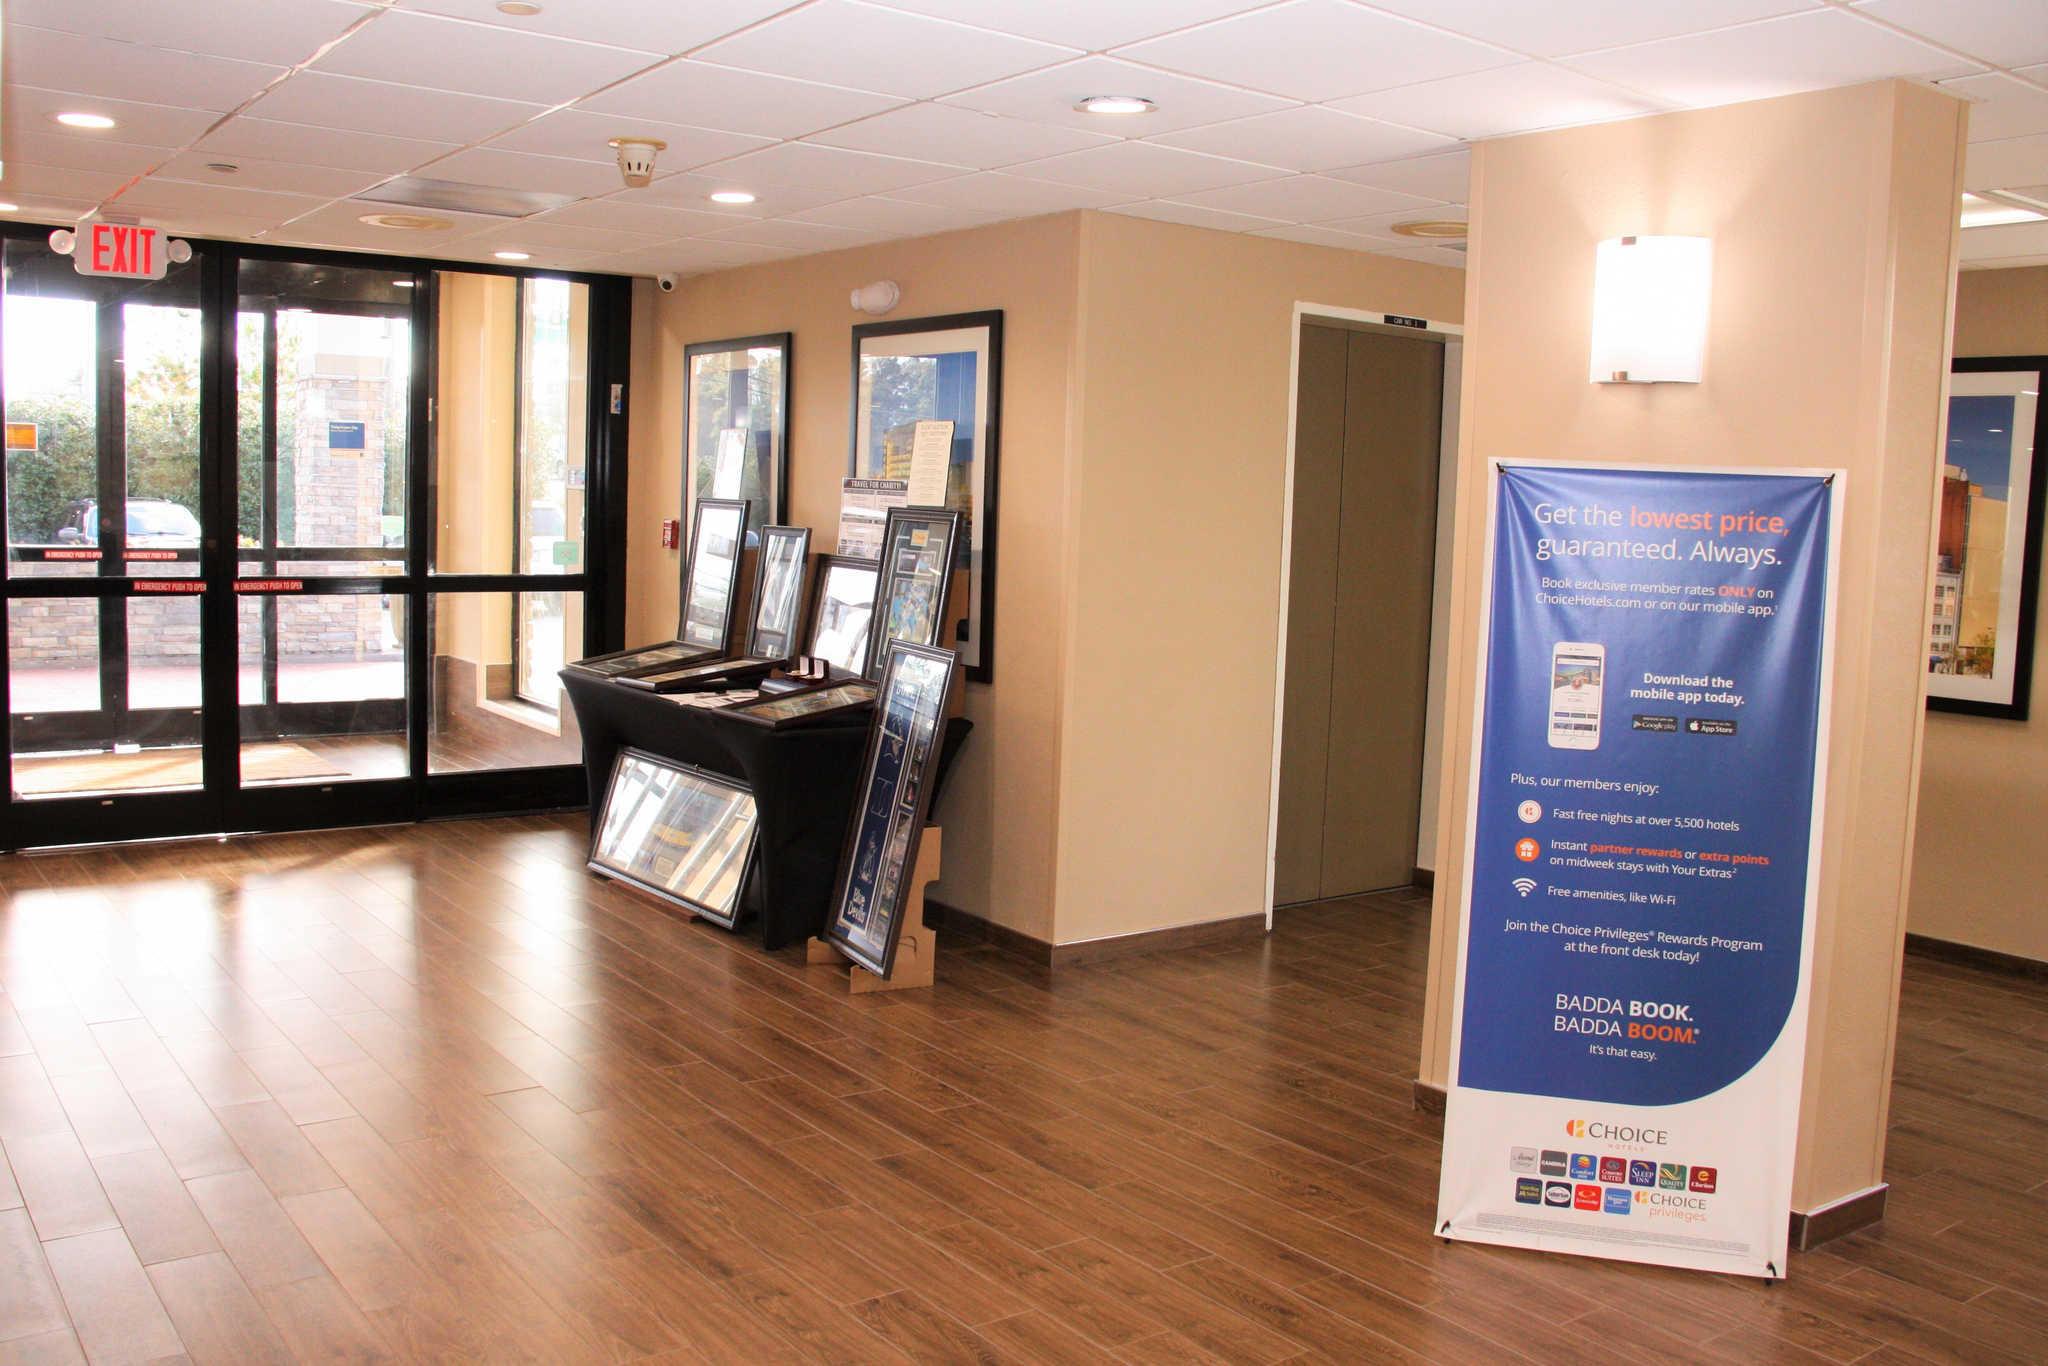 Comfort Inn & Suites Duke University-Downtown image 6